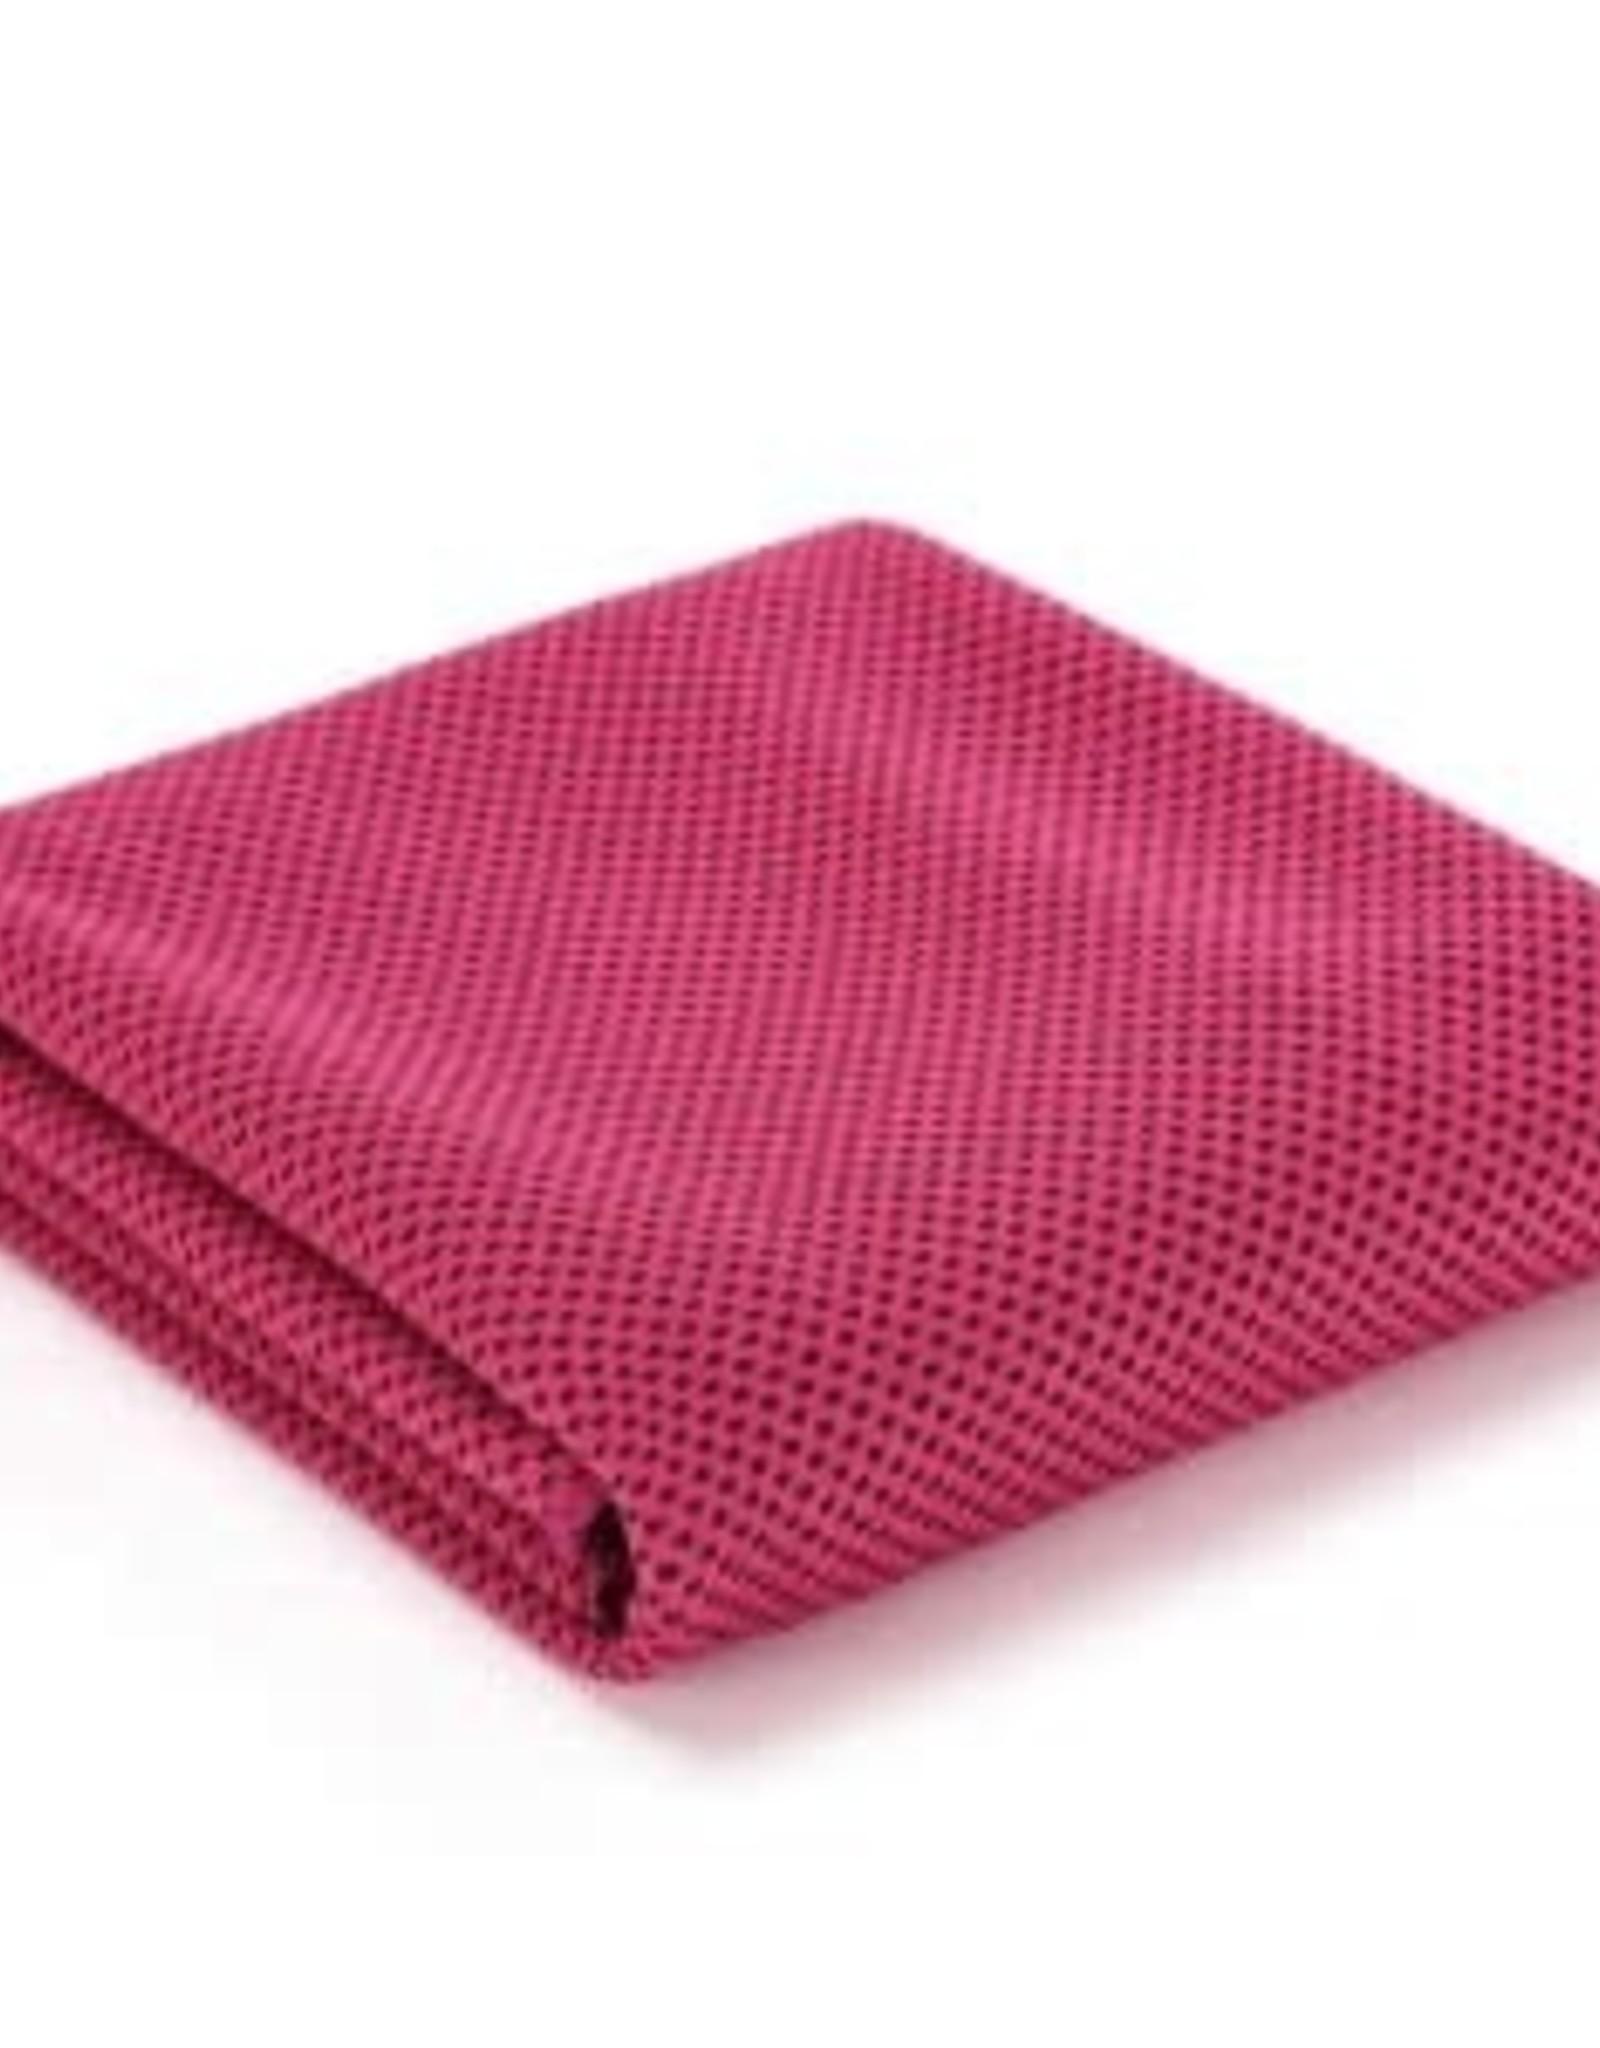 pictet-fino Pictet - Fino Cooling Towels 120*30cm